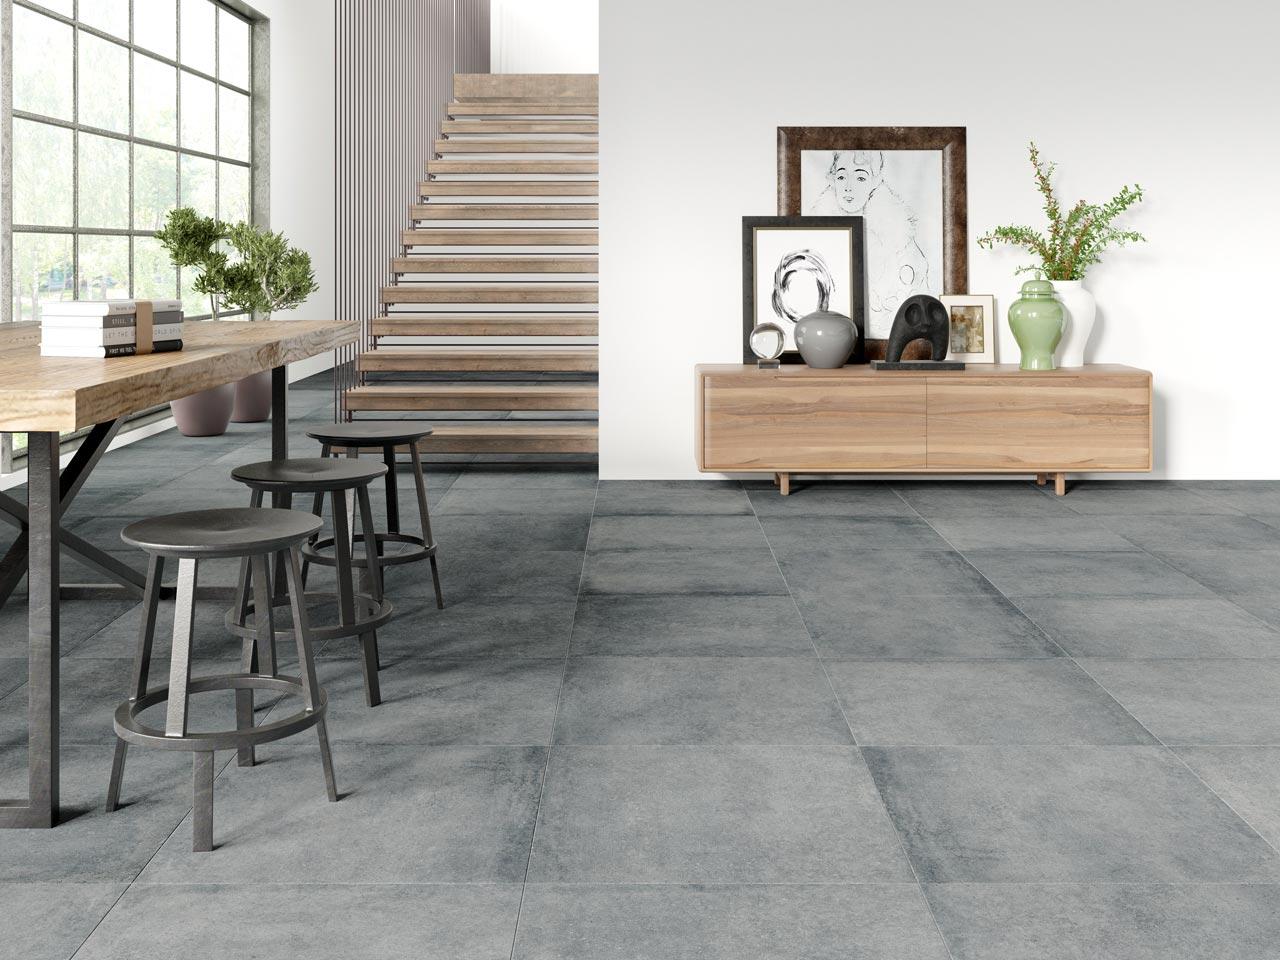 mozaic, concrete